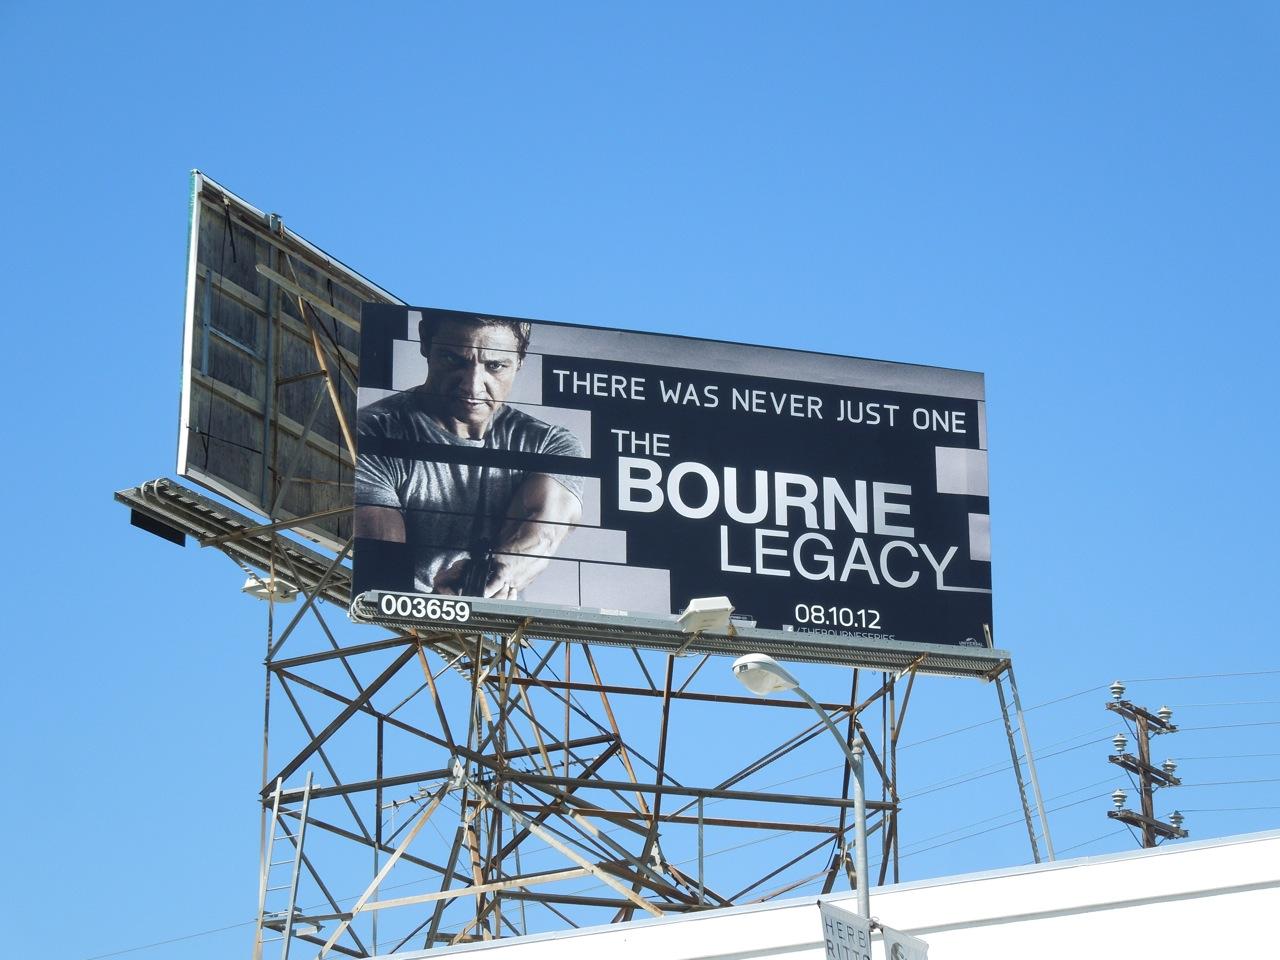 http://1.bp.blogspot.com/-M4n-TvxG-VU/UBLoKklbwhI/AAAAAAAAul4/PLZq4j3QqSw/s1600/bourne+legacy+billboard.jpg